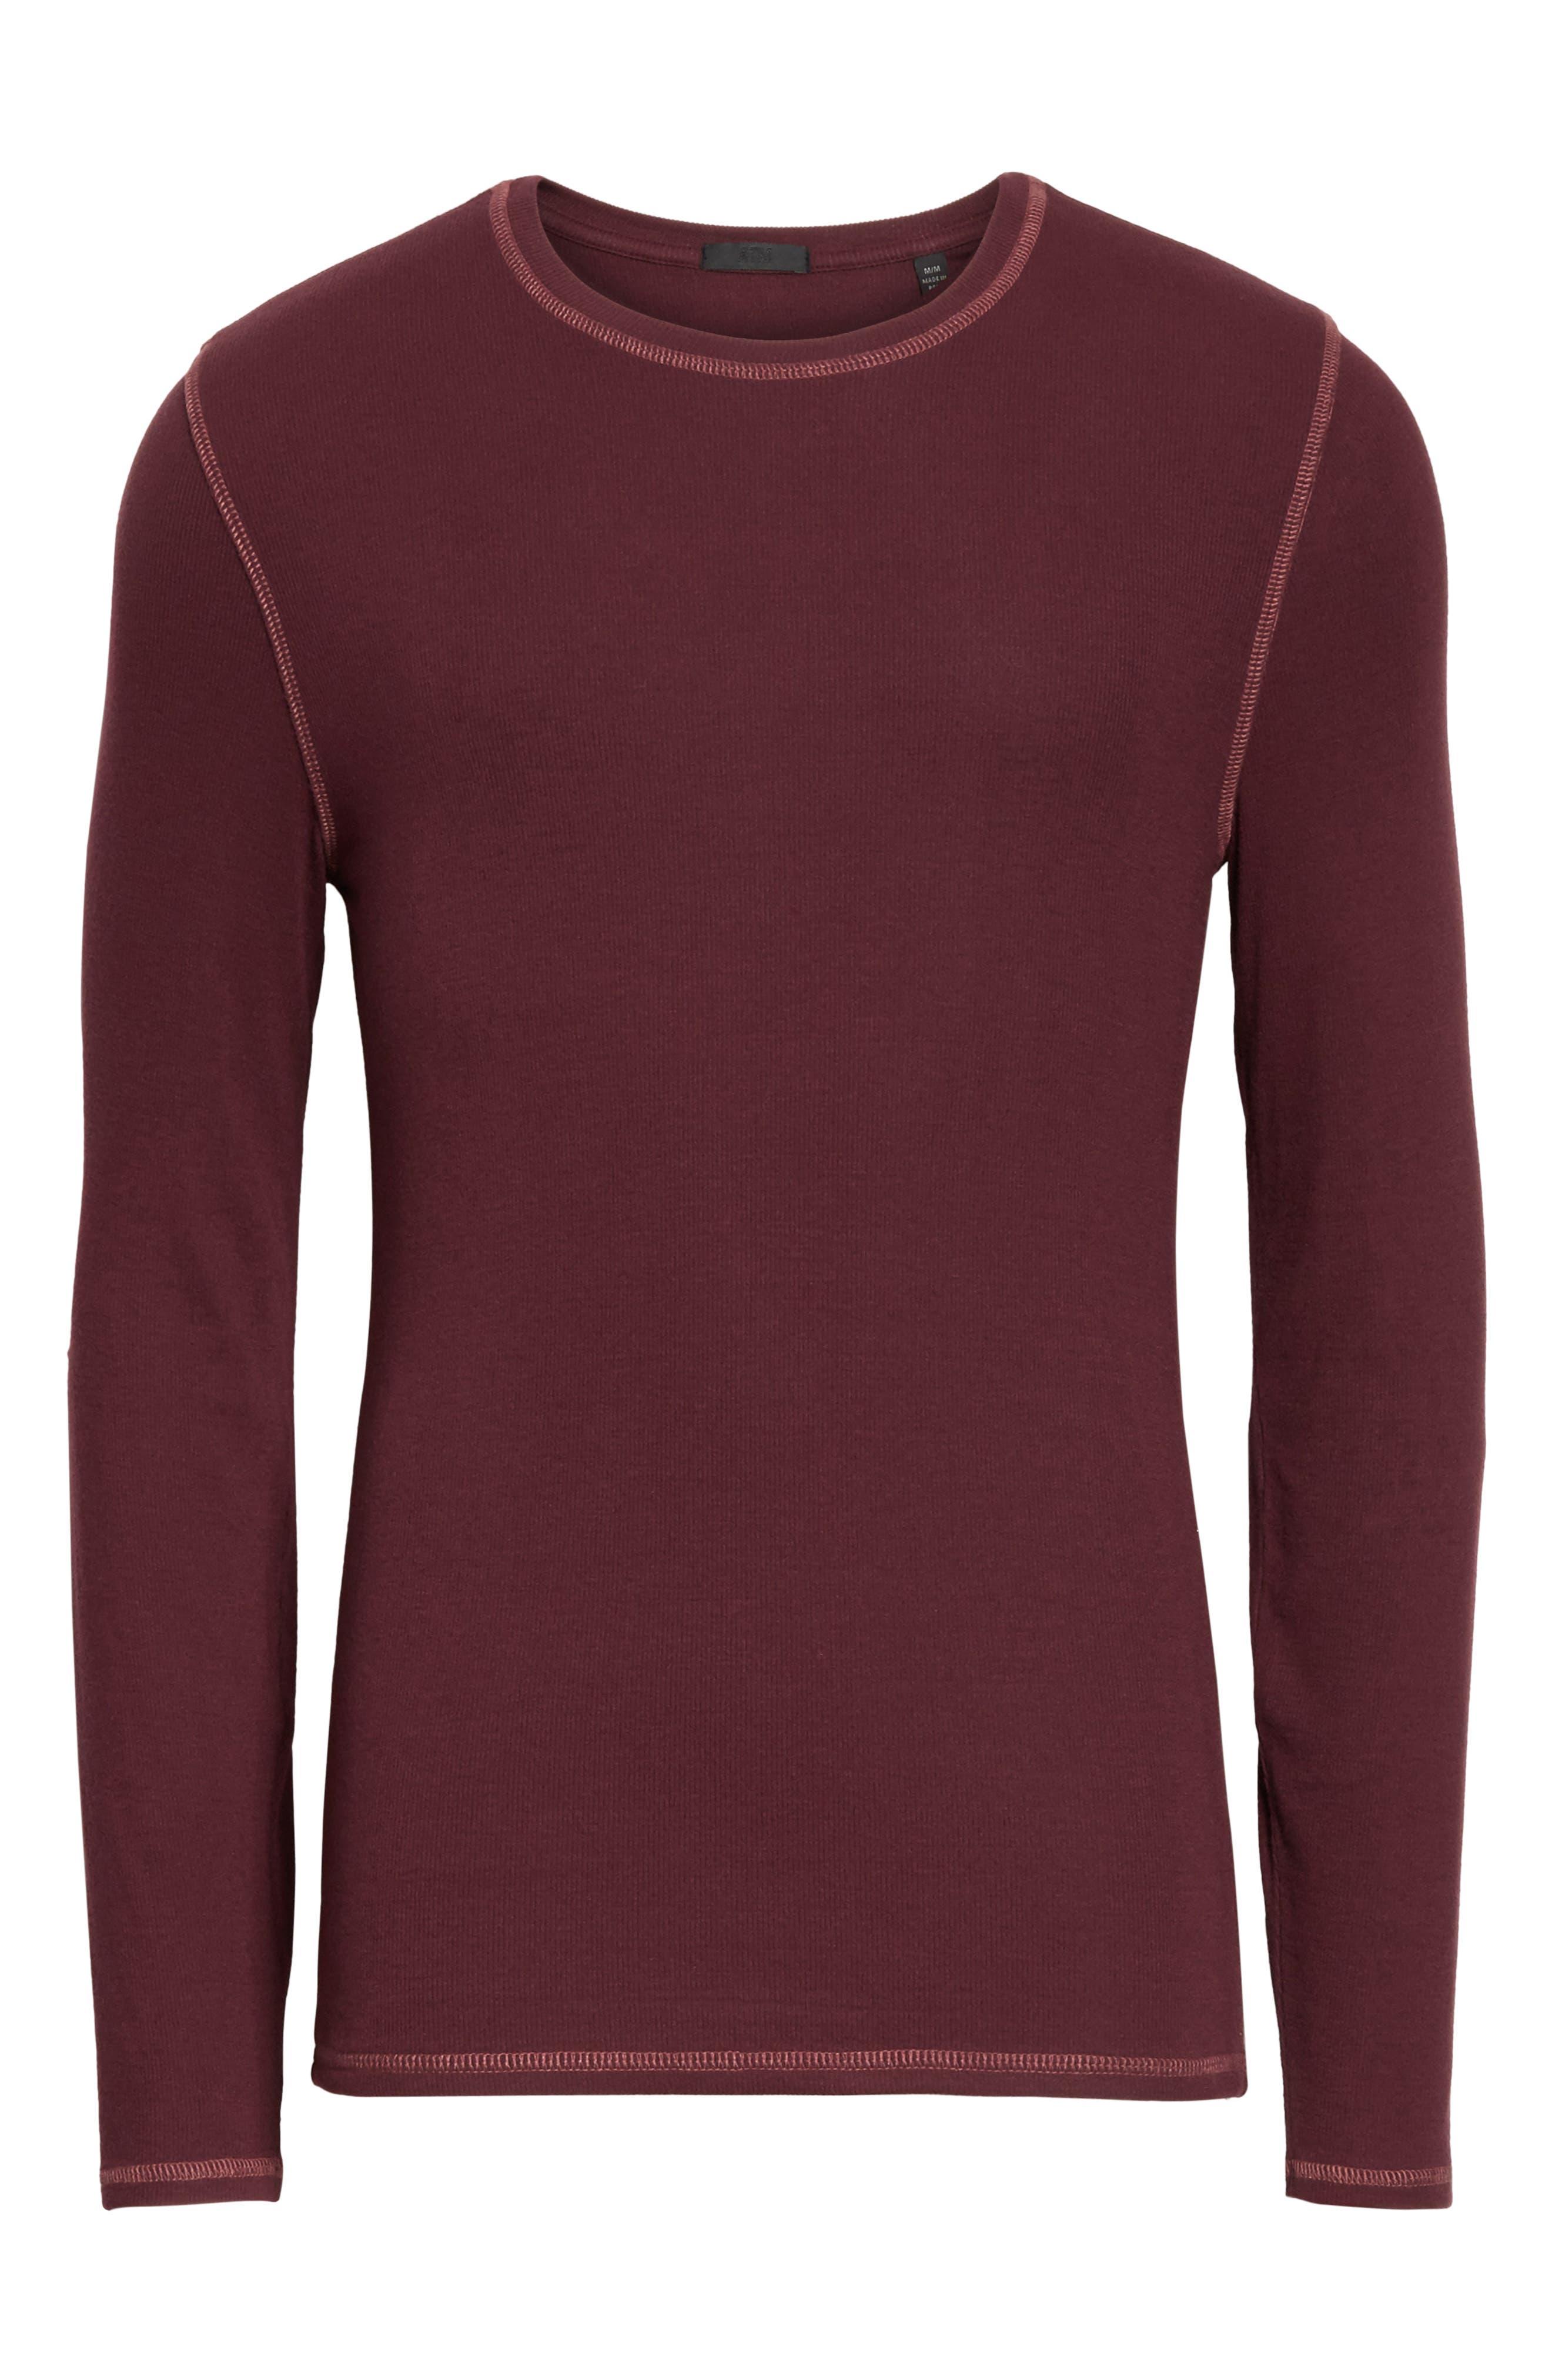 Rib Modal Crewneck Sweater,                             Alternate thumbnail 6, color,                             Merlot